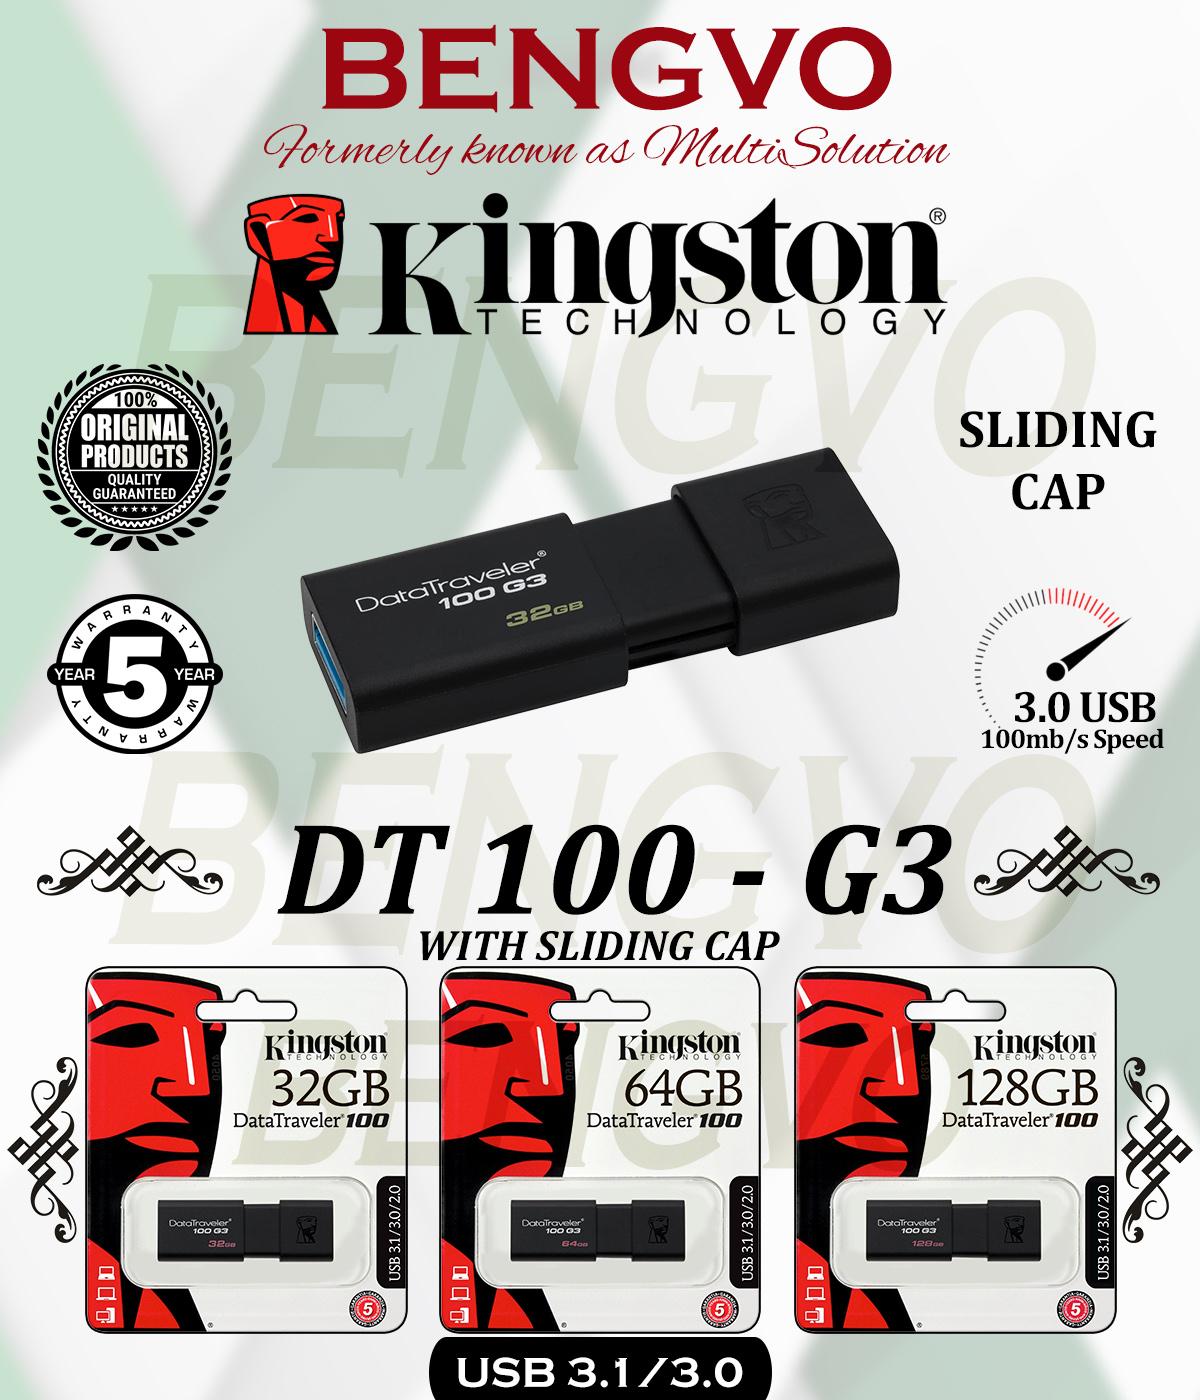 KINGSTON DT100 G3 3.0 USB FLASH DRIVE - 32GB - 64GB -128GB - 5 Years Warranty